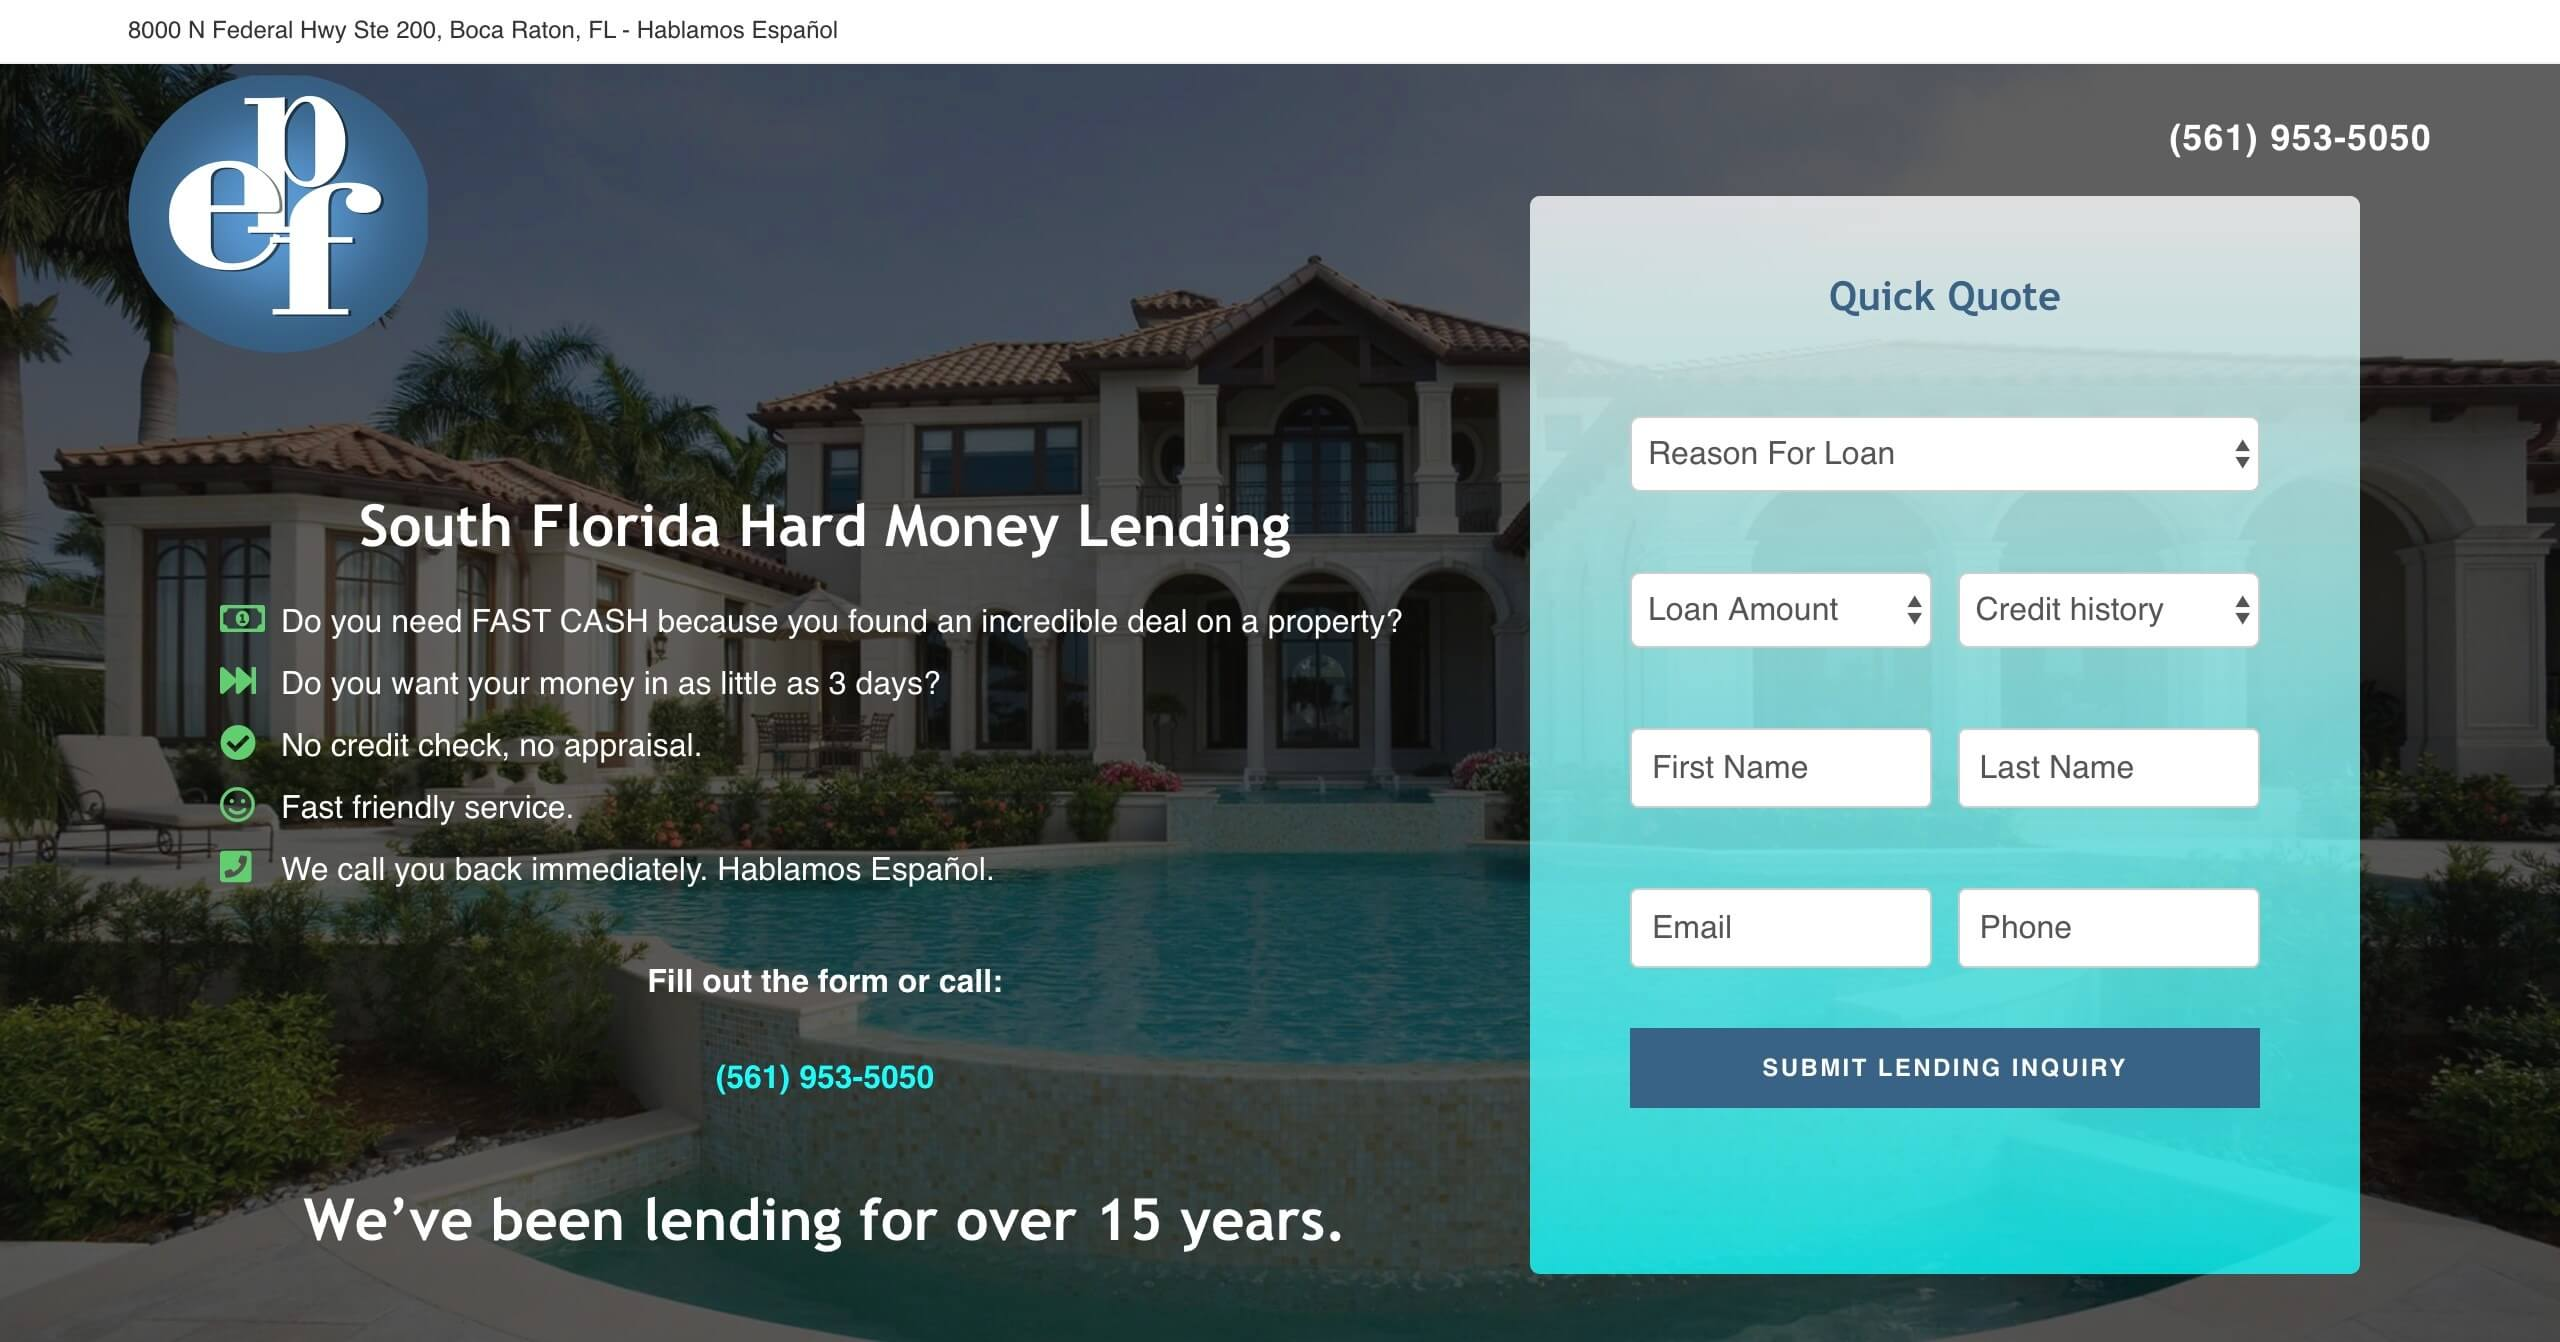 EPF Hard Money Lending - Case Study